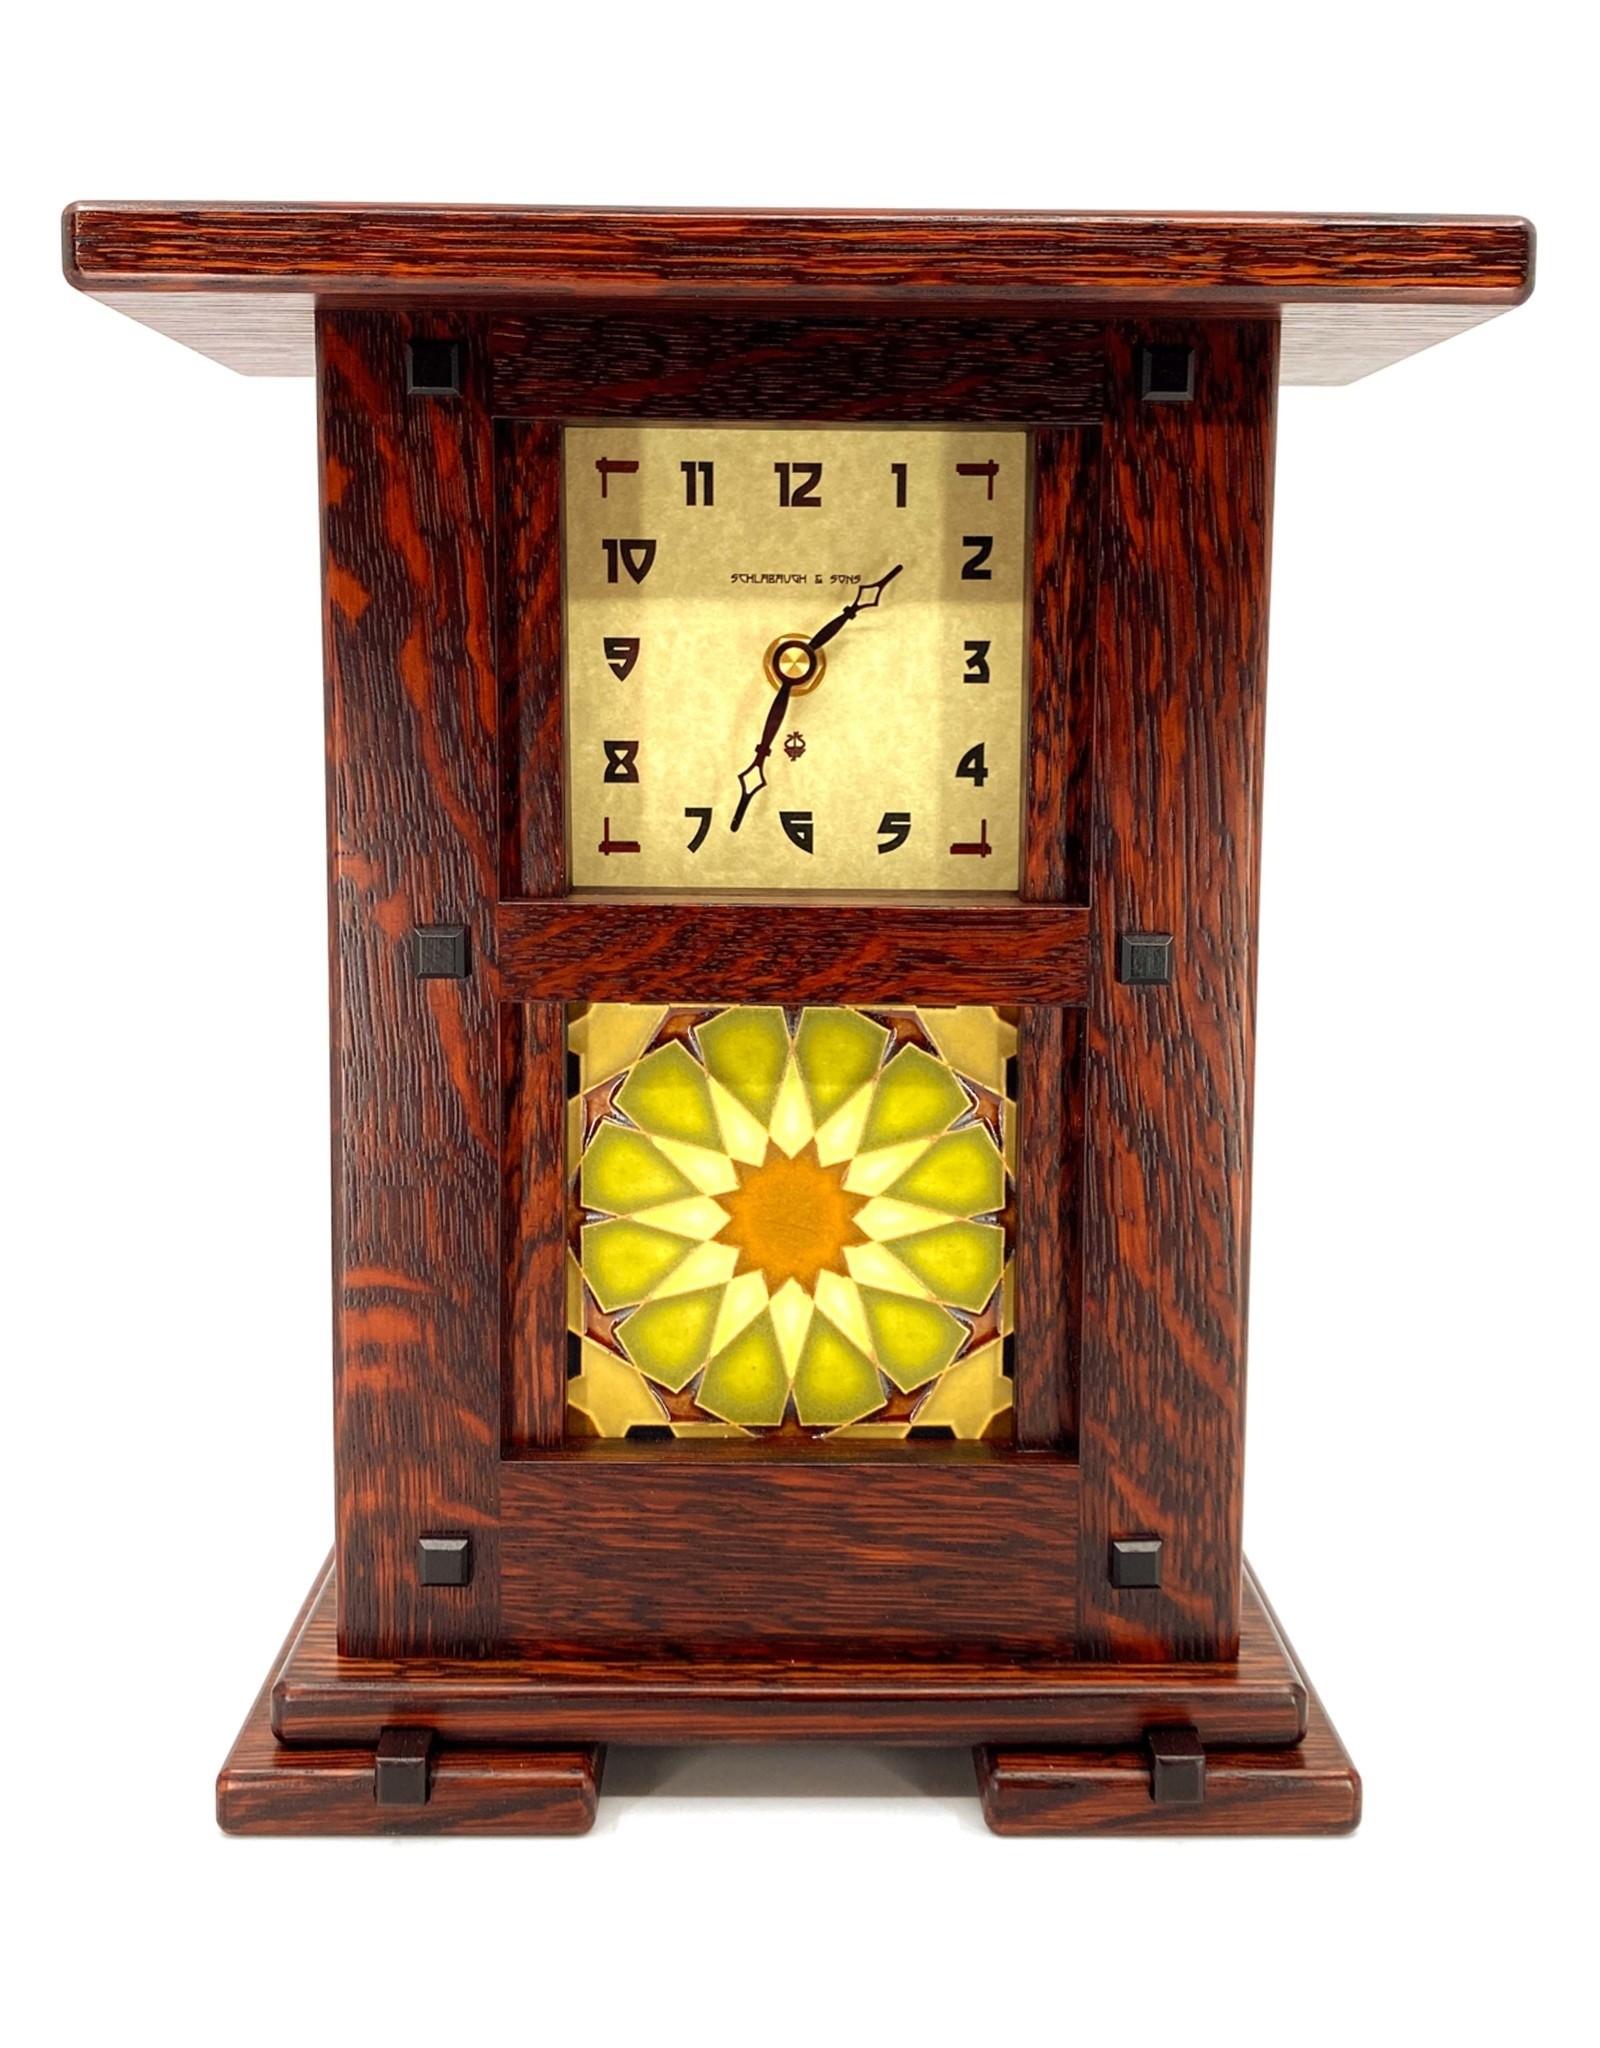 SCHLABAUGH & SONS GREENE & GREENE SOLID OAK TILE MANTLE CLOCK